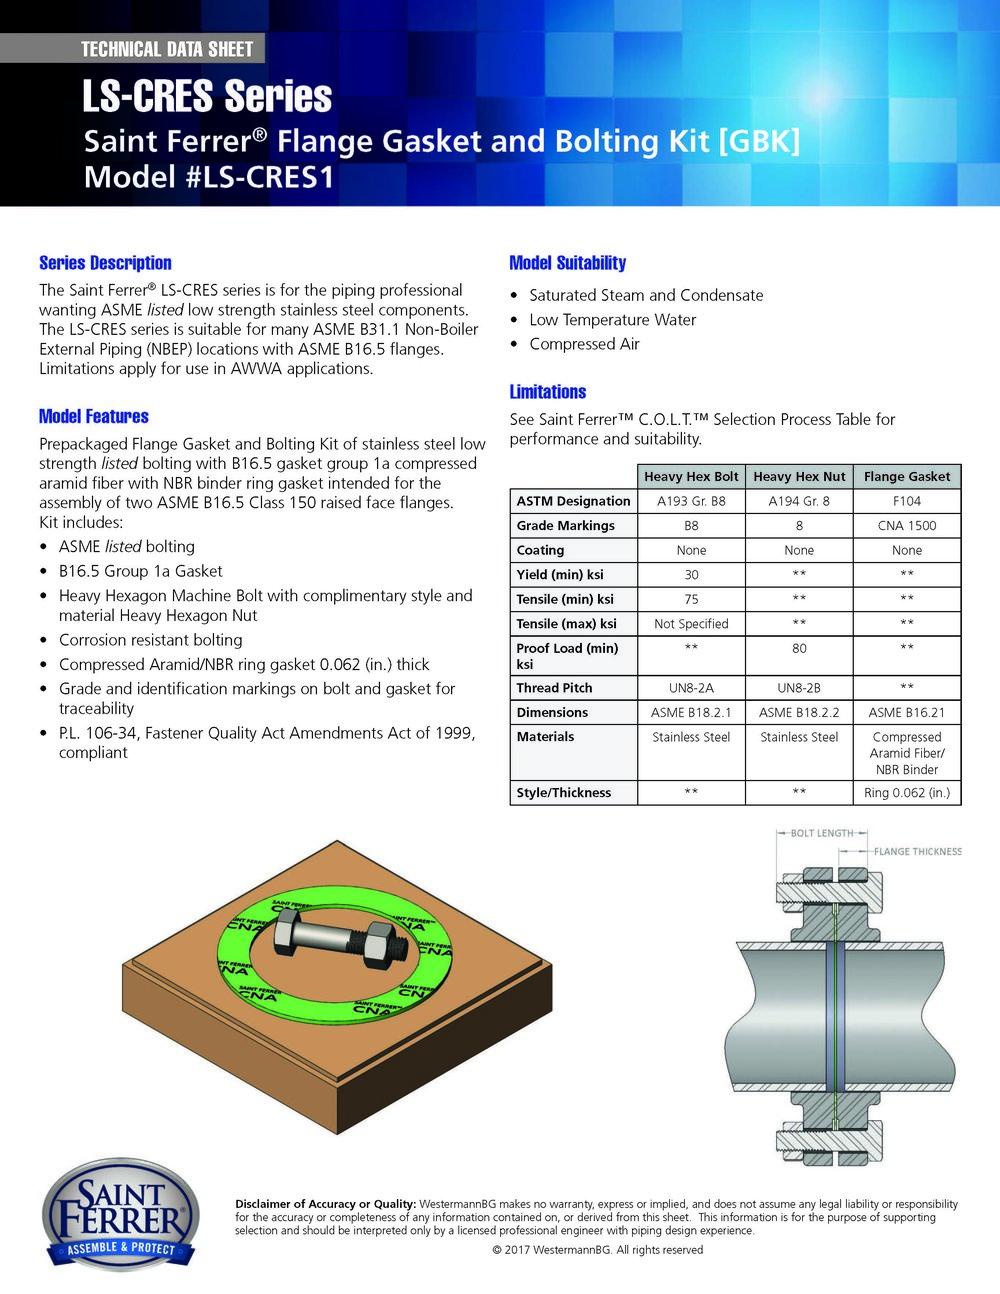 SF_Data_Sheet_LS-CRES_Series_LS-CRES1.jpg